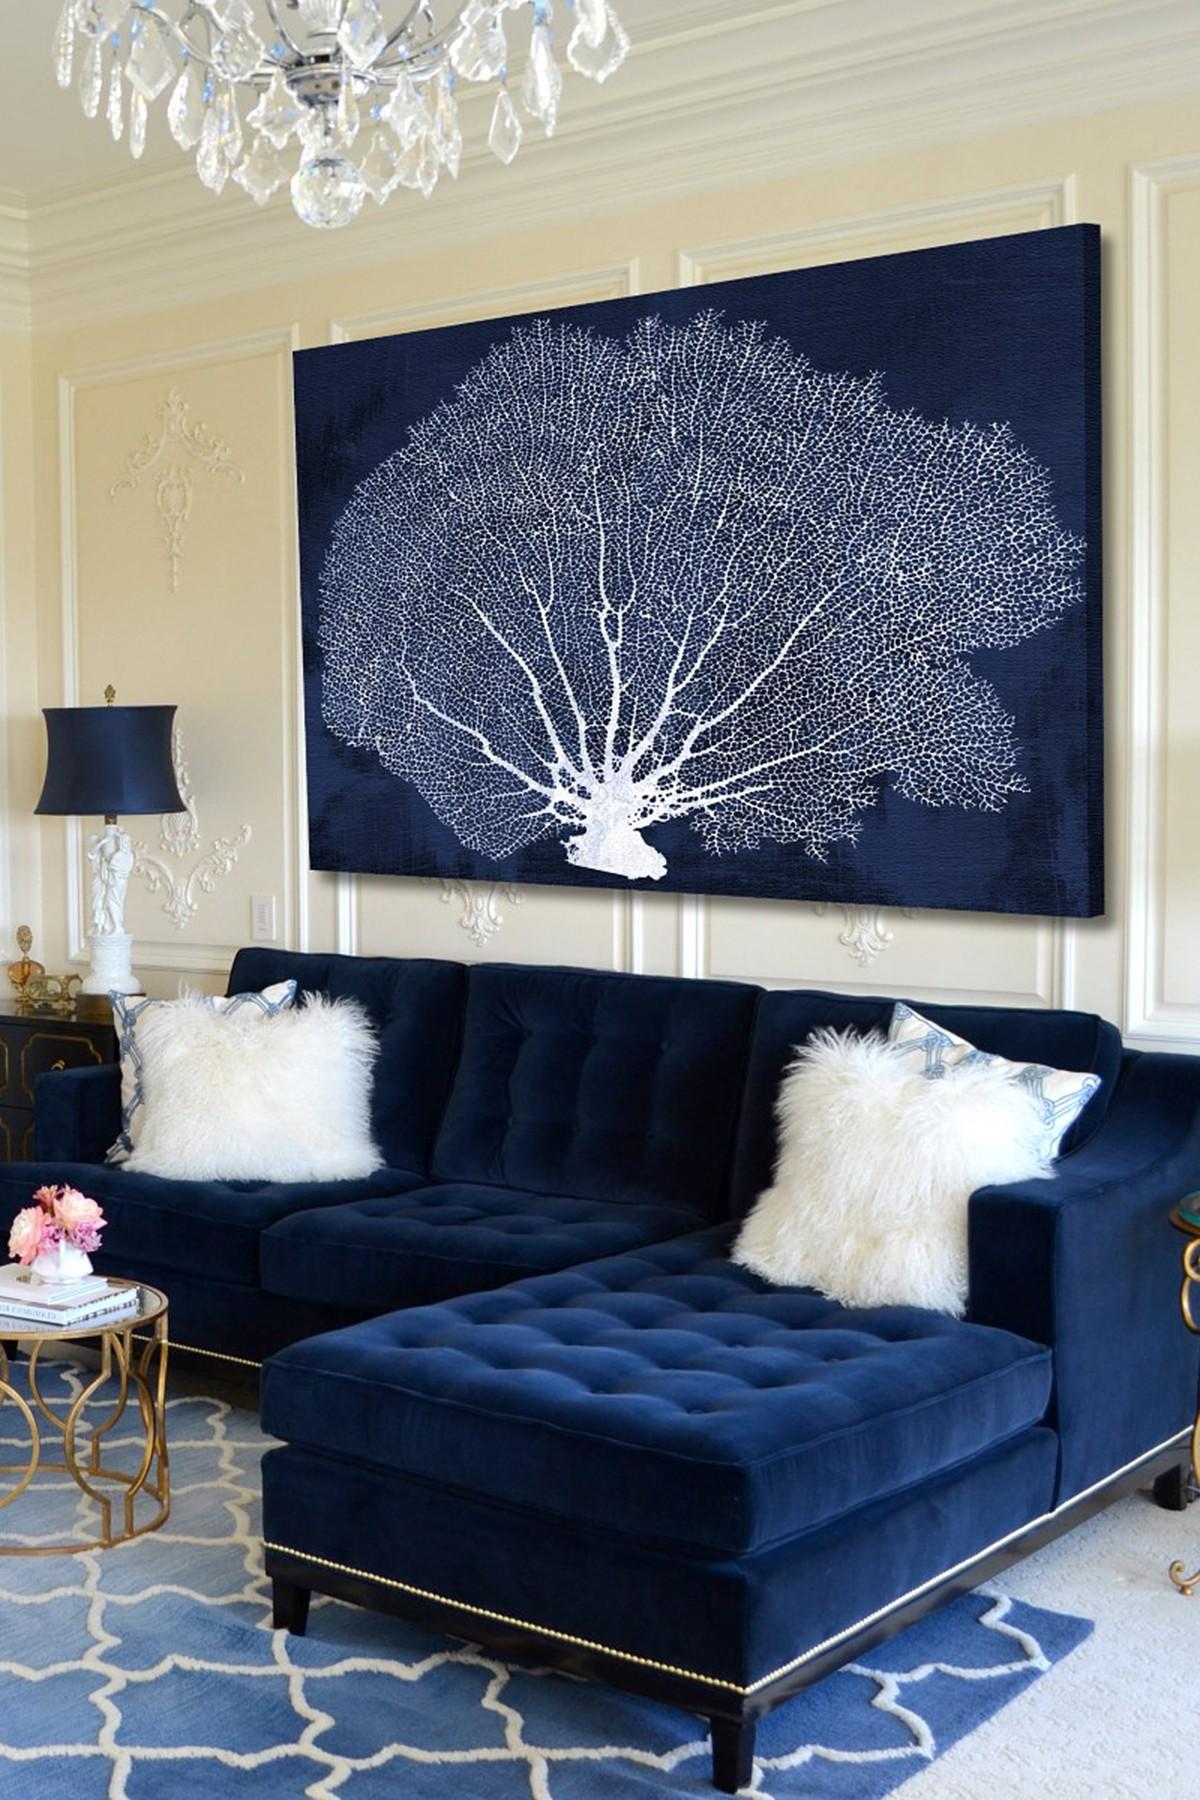 Синий диван в стиле неоклассики